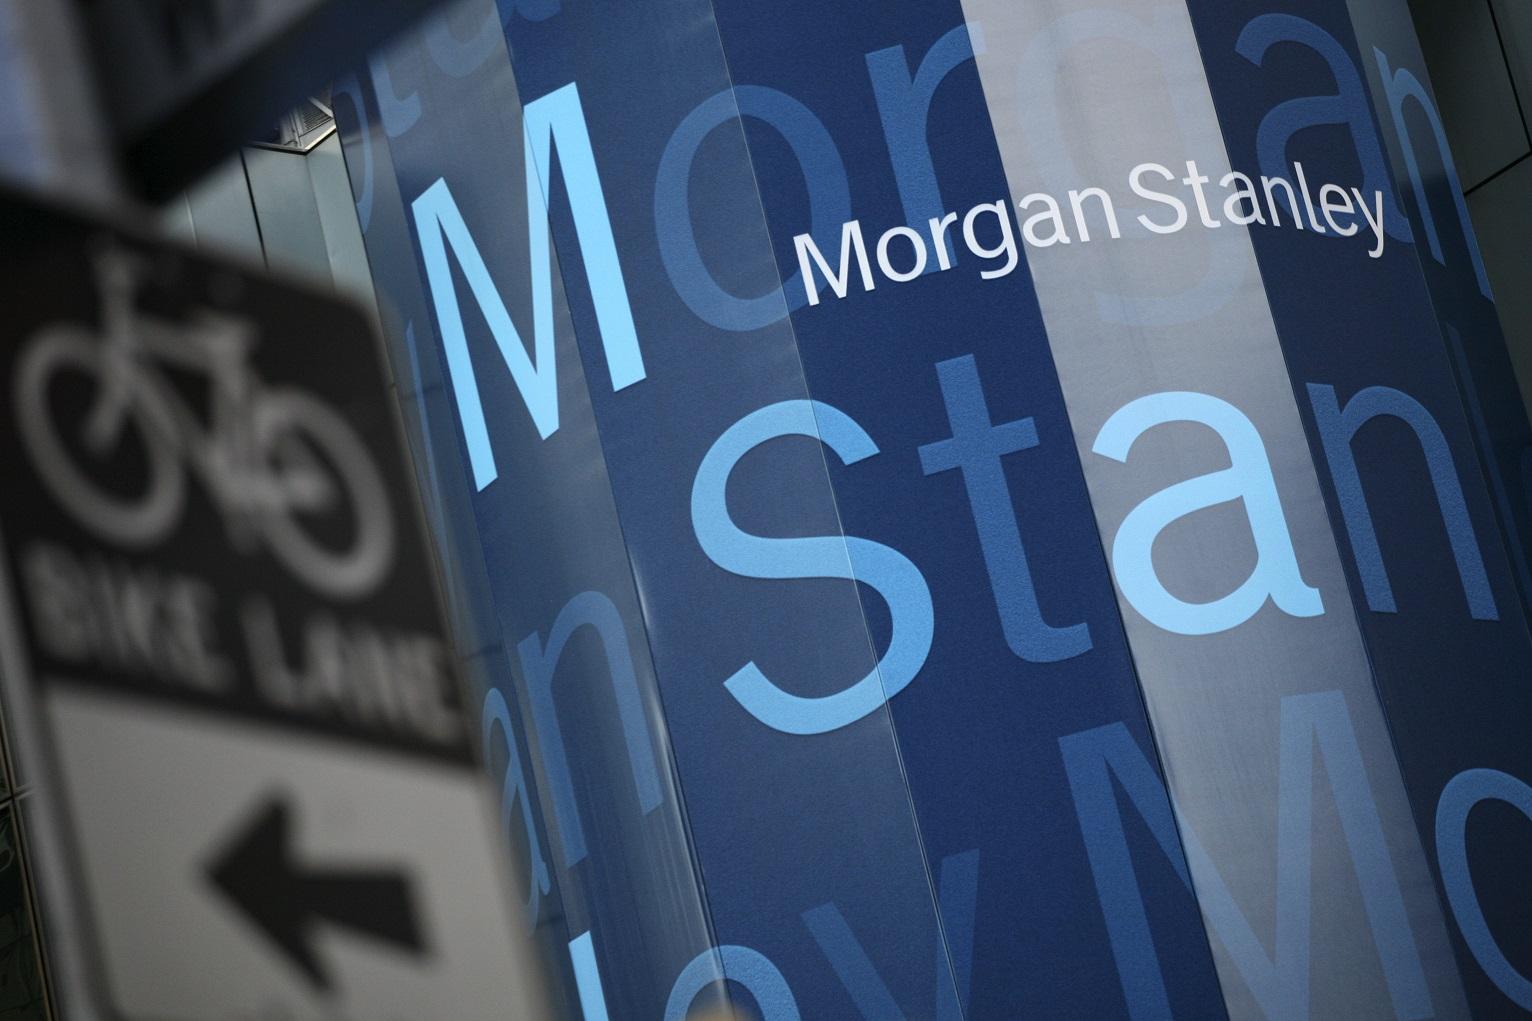 Morgan Stanley S 16 000 Human Brokers Get Algorithmic